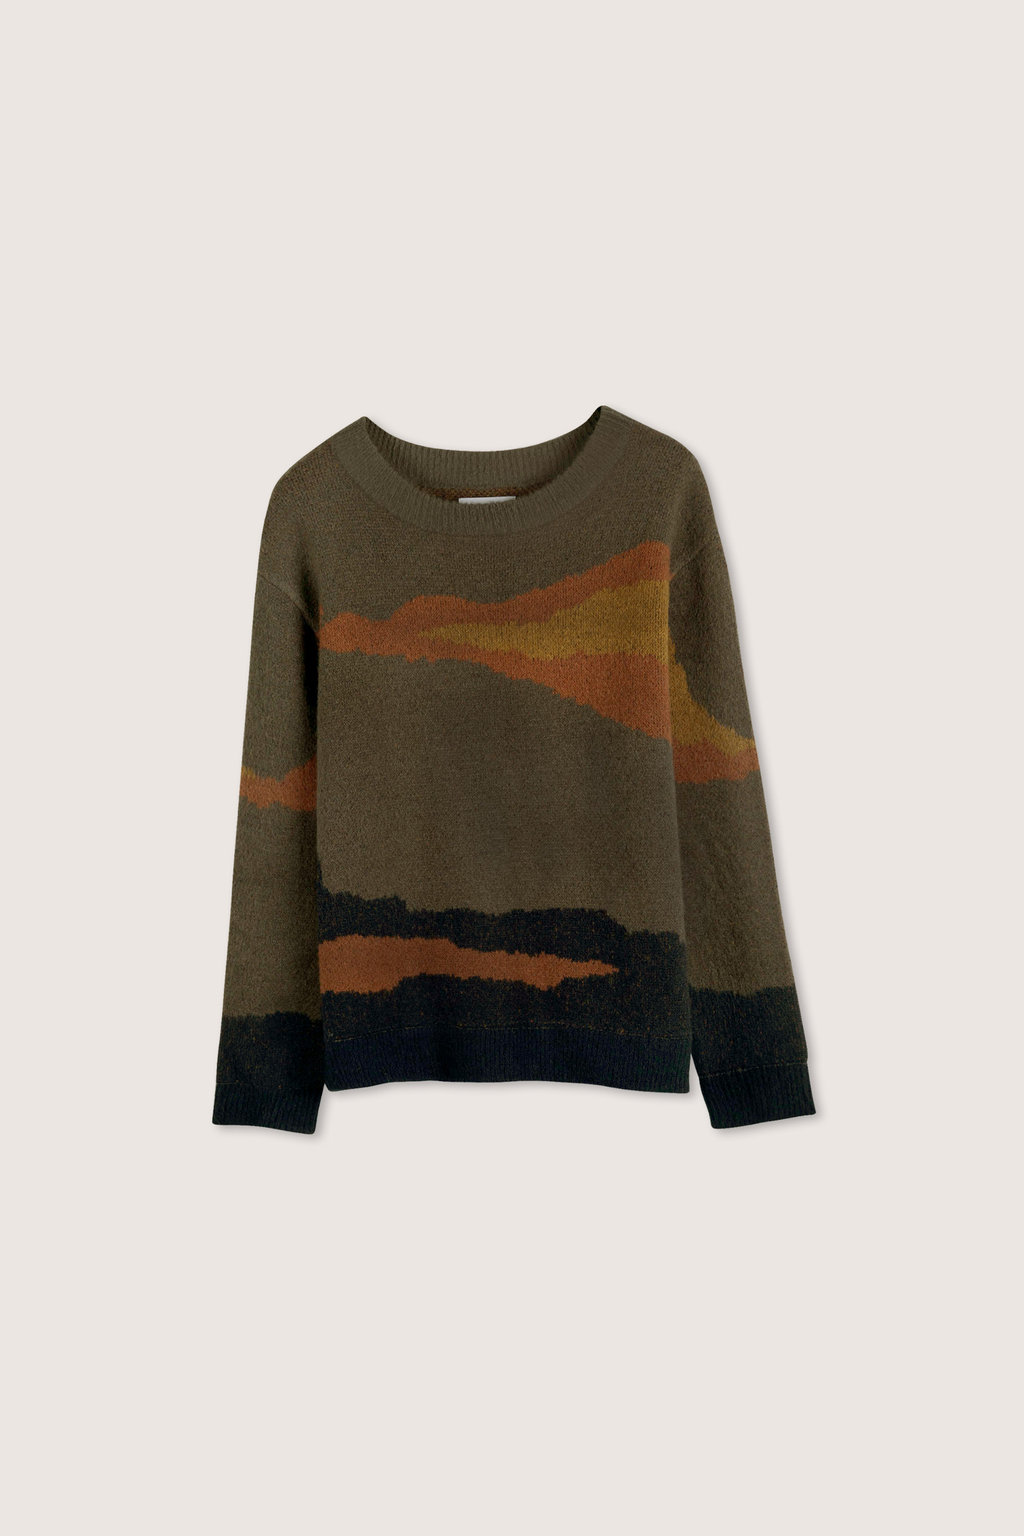 Sweater 1954 Olive 8